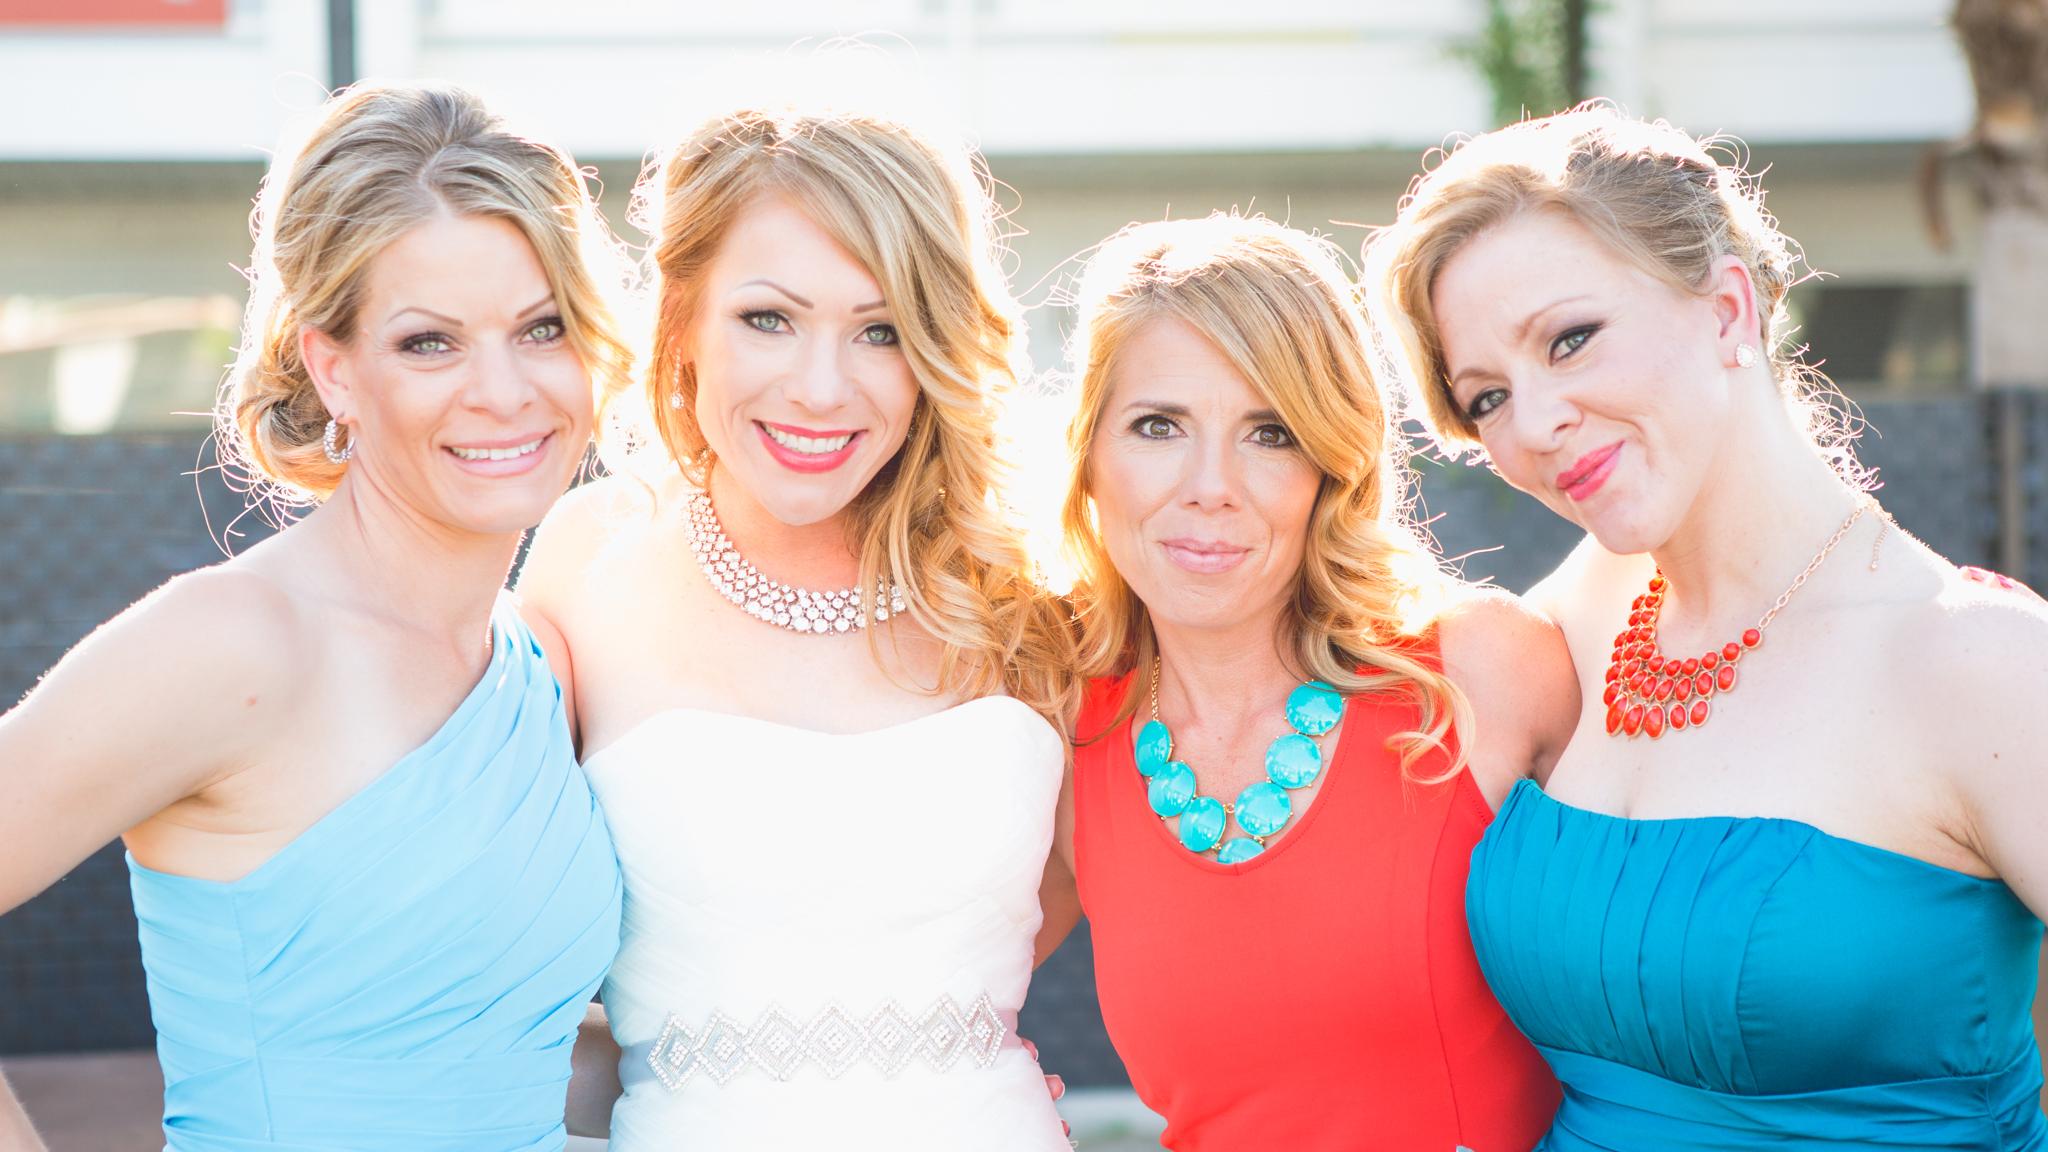 scottsdale-wedding-photographer-el-dorado-bride-sisters-colorful-backlit